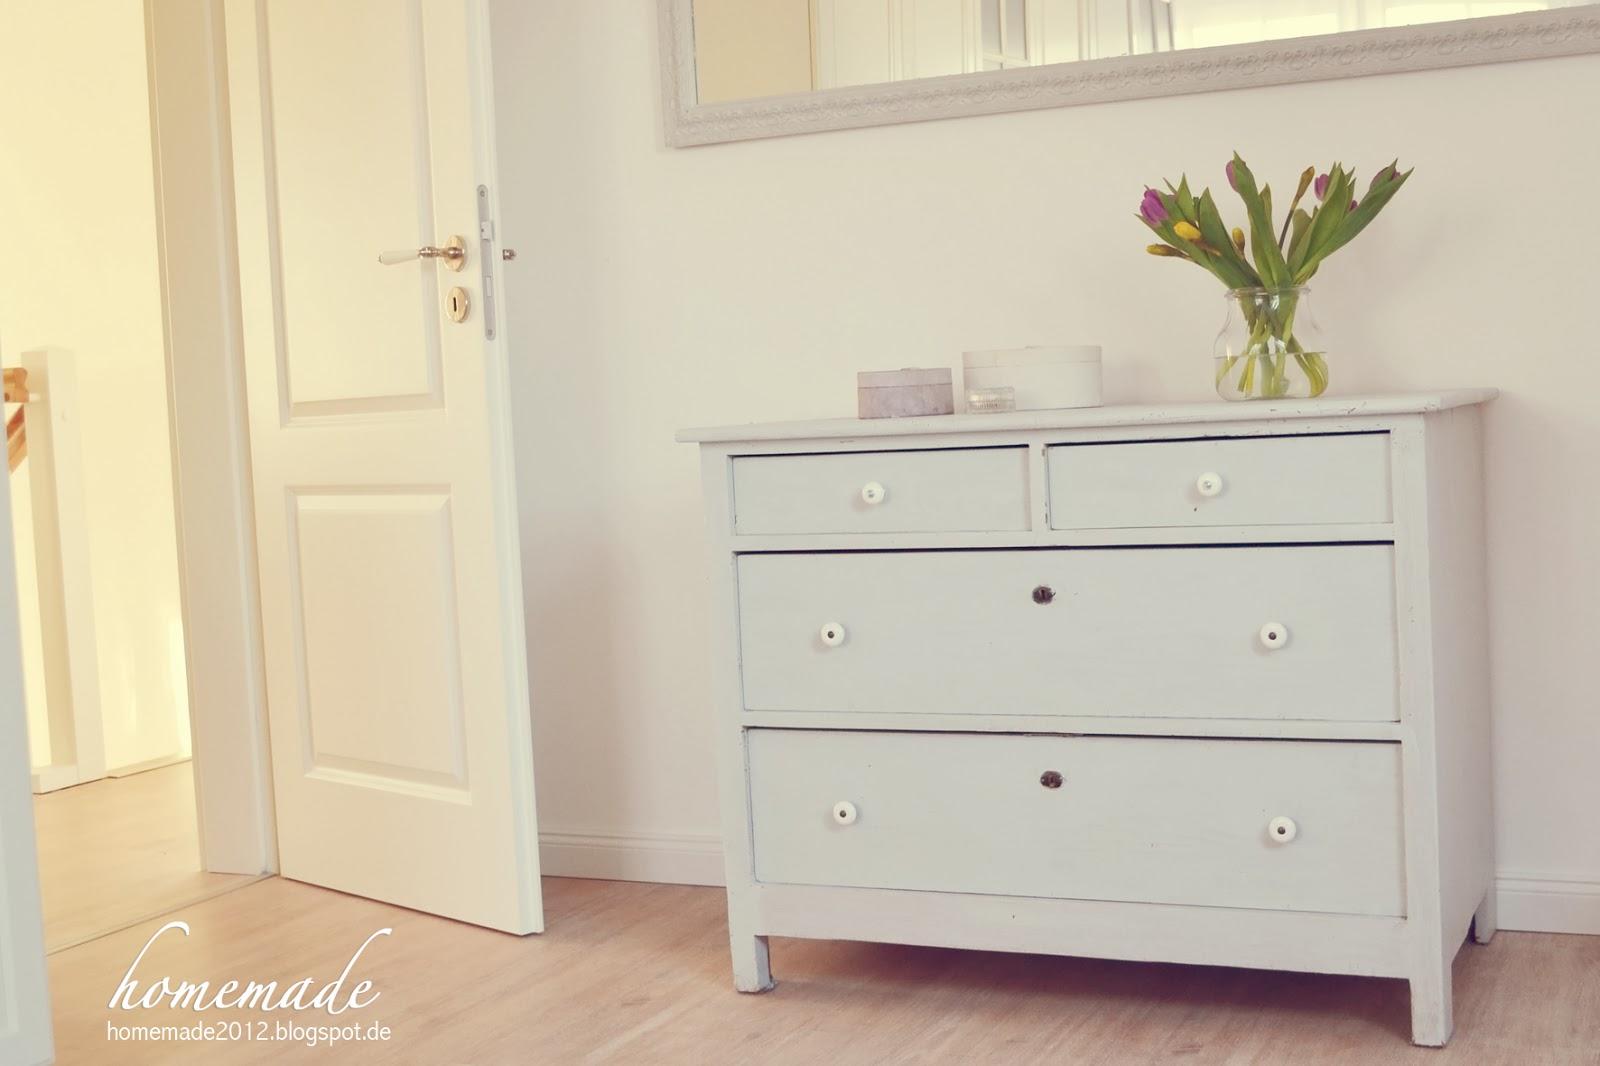 homemade ein blick ins schlafzimmer. Black Bedroom Furniture Sets. Home Design Ideas